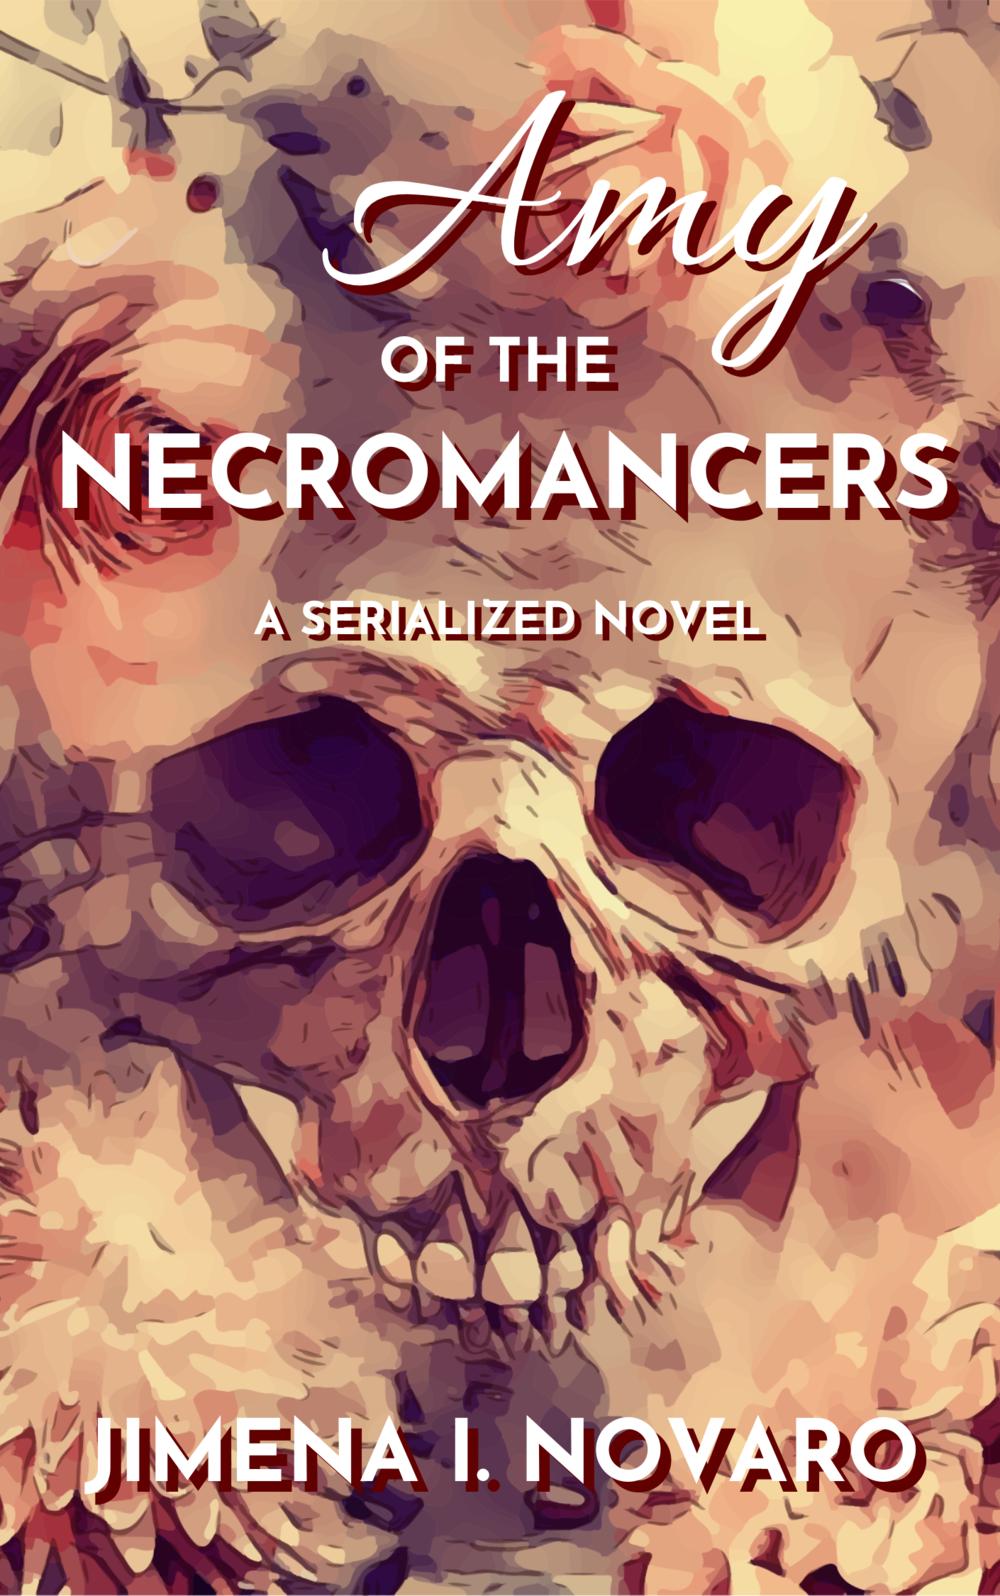 Amy of the Necromancers by Jimena I. Novaro | Book Review